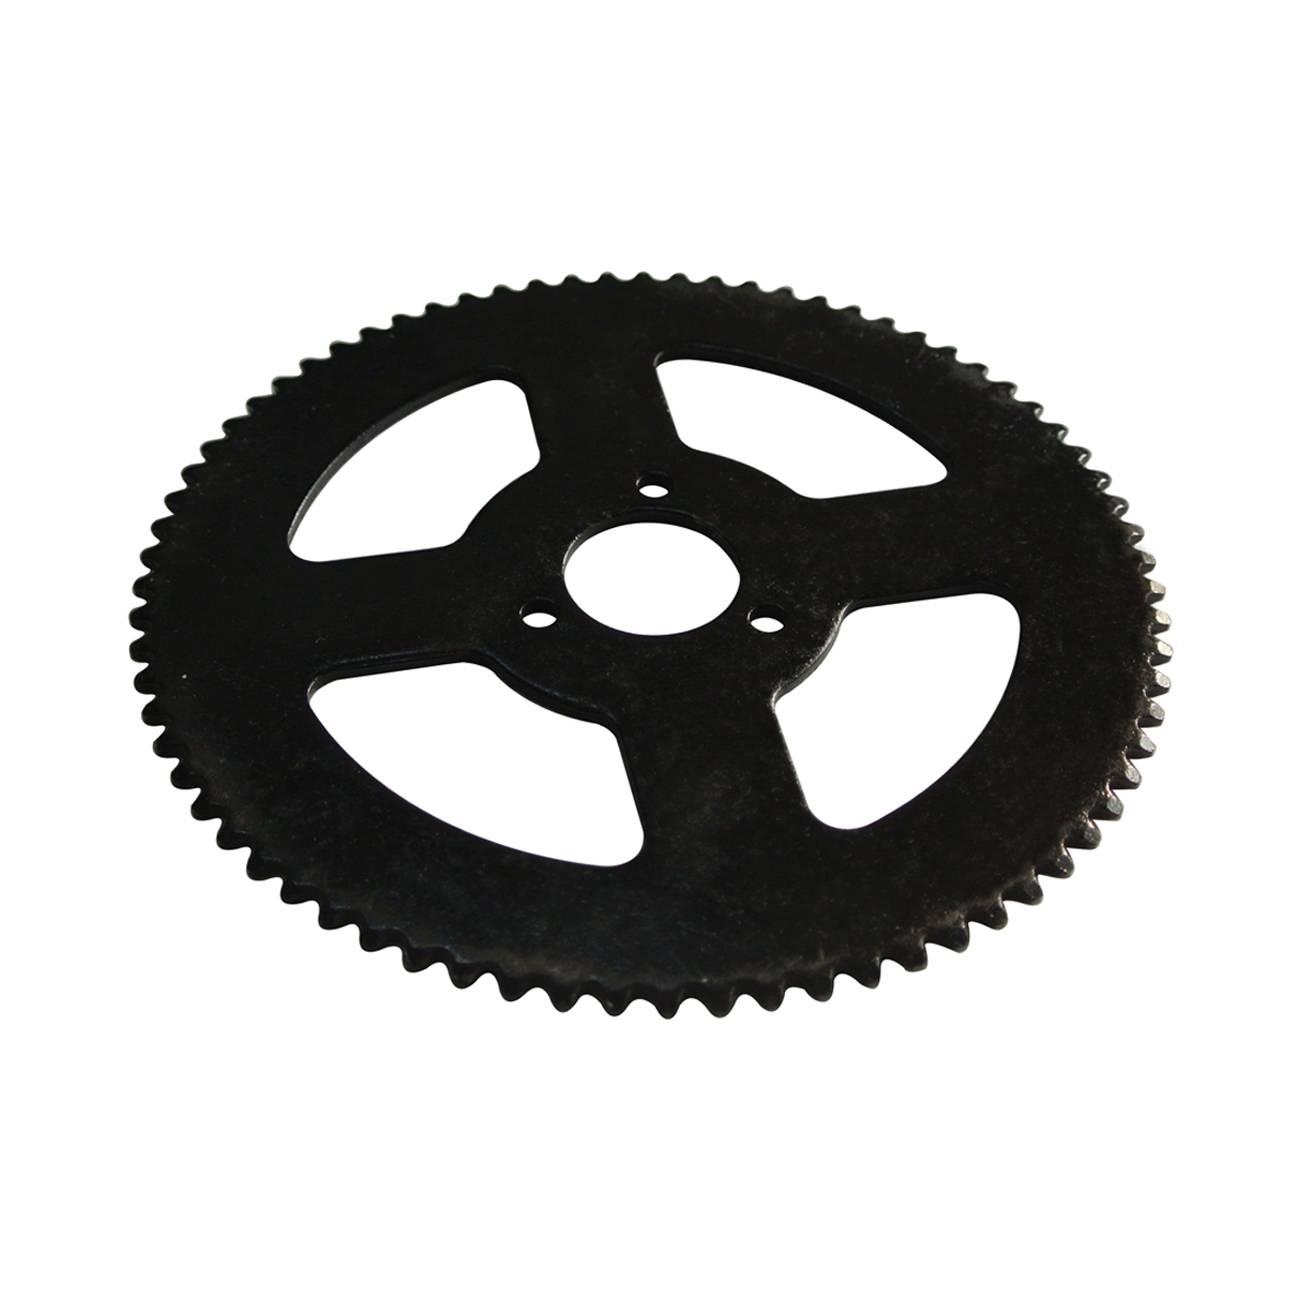 74 T סבבת בורג ל רוקט Pocket עפר מיני שרשרת 25 H Quad הבור אופני טרקטורונים